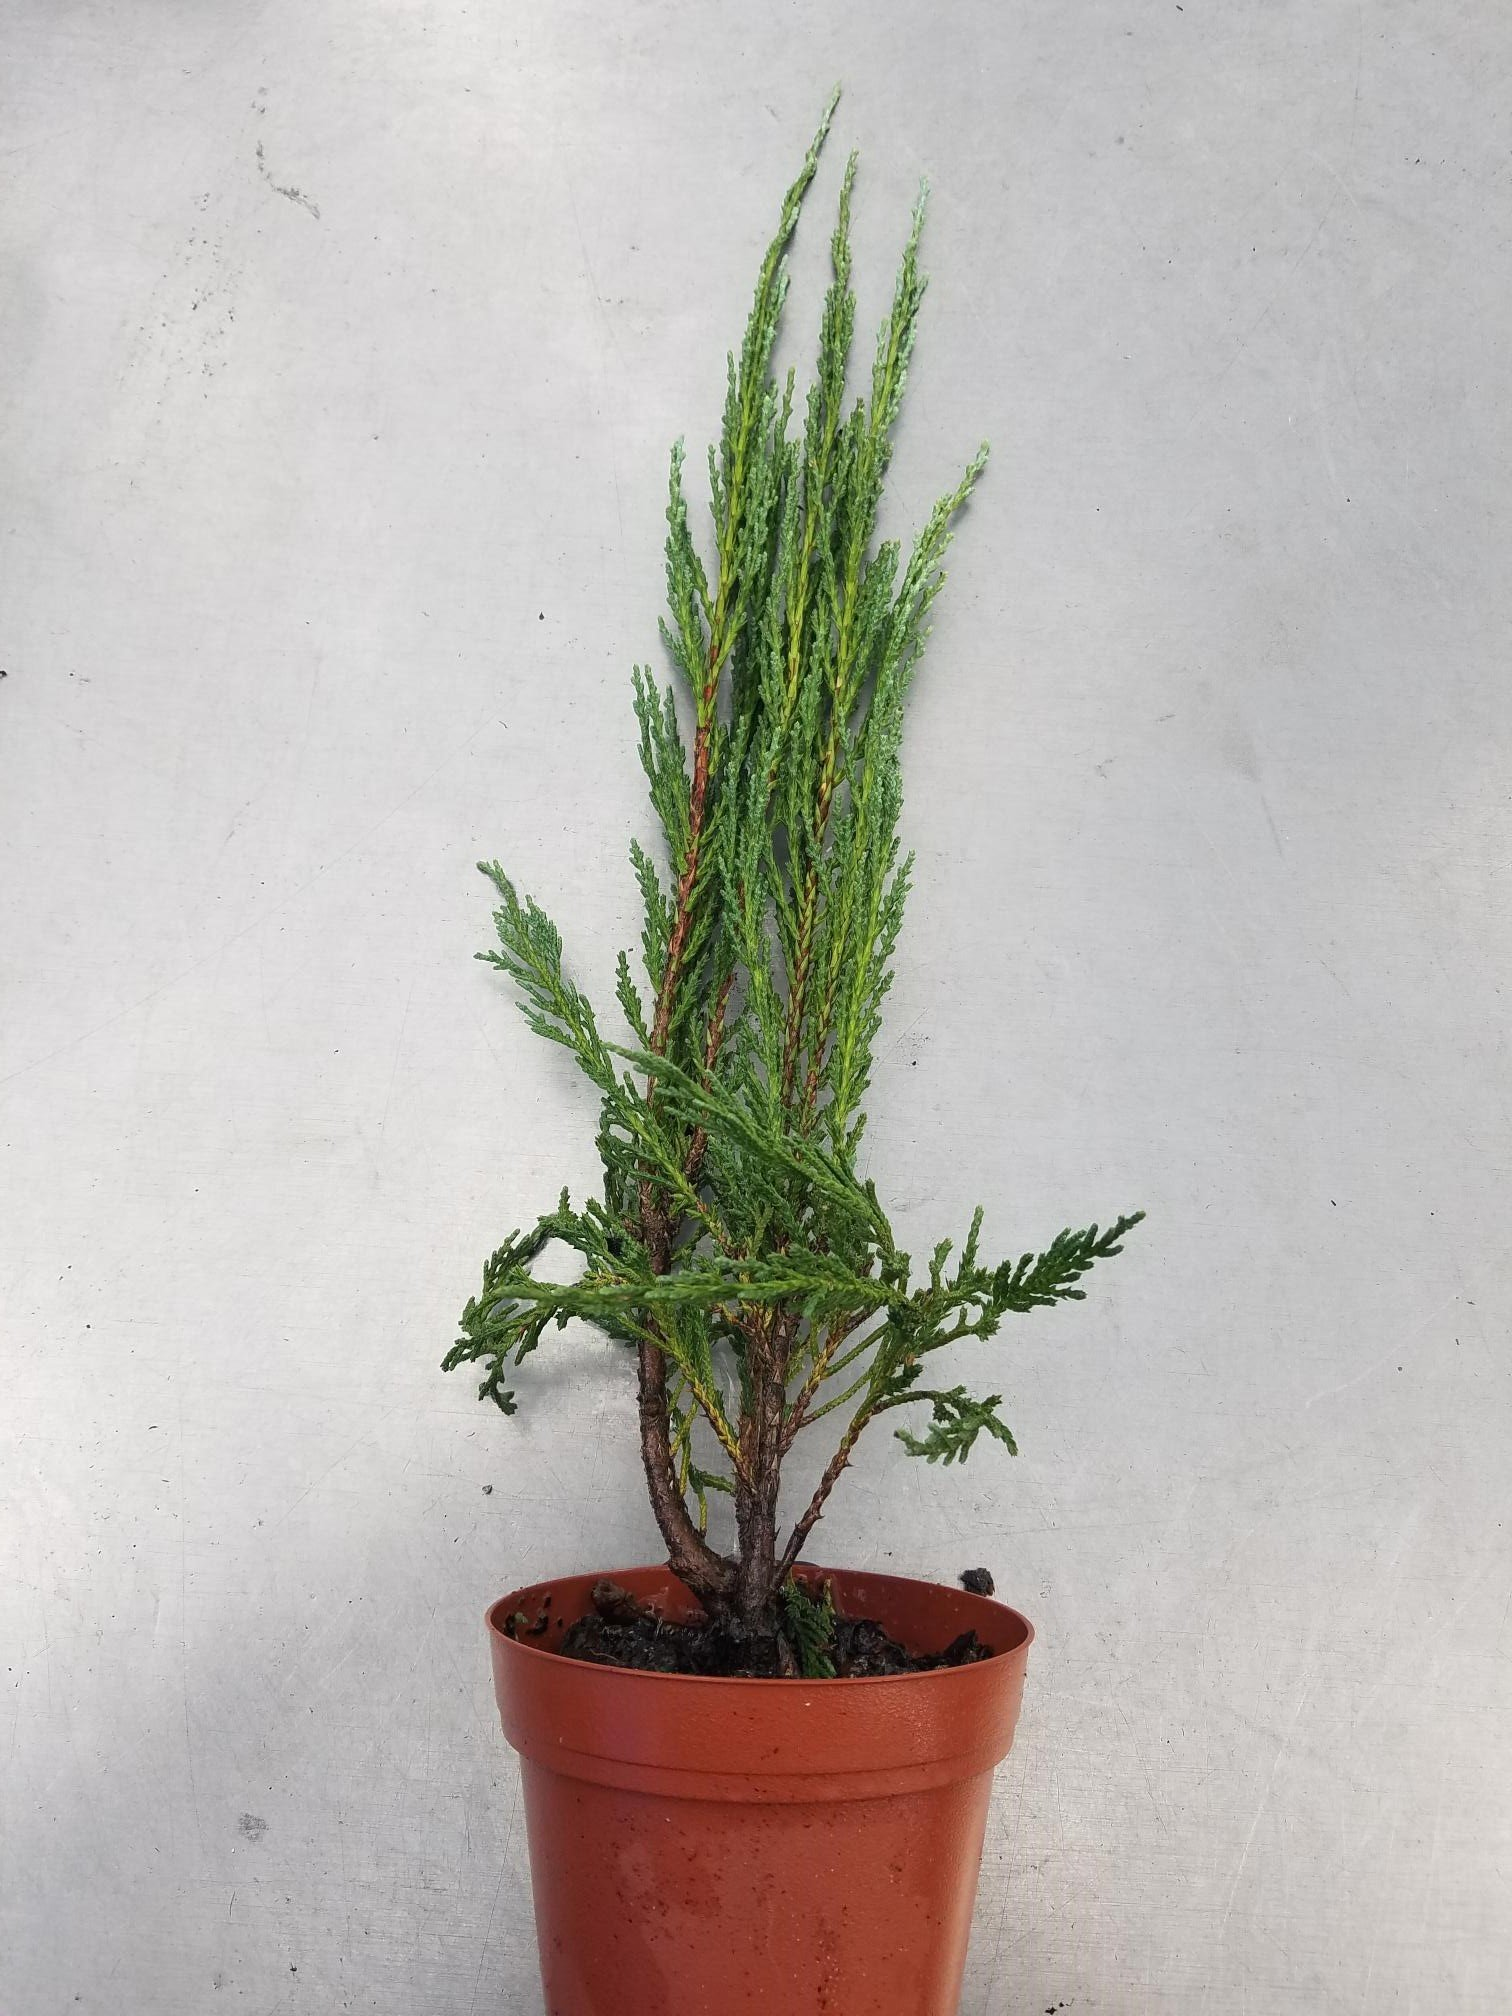 Sandys Nursery Online Juniperus scopulorum 'Blue Arrow' 4 inch Pot Lot of 20 by Sandys Nursery Online (Image #3)